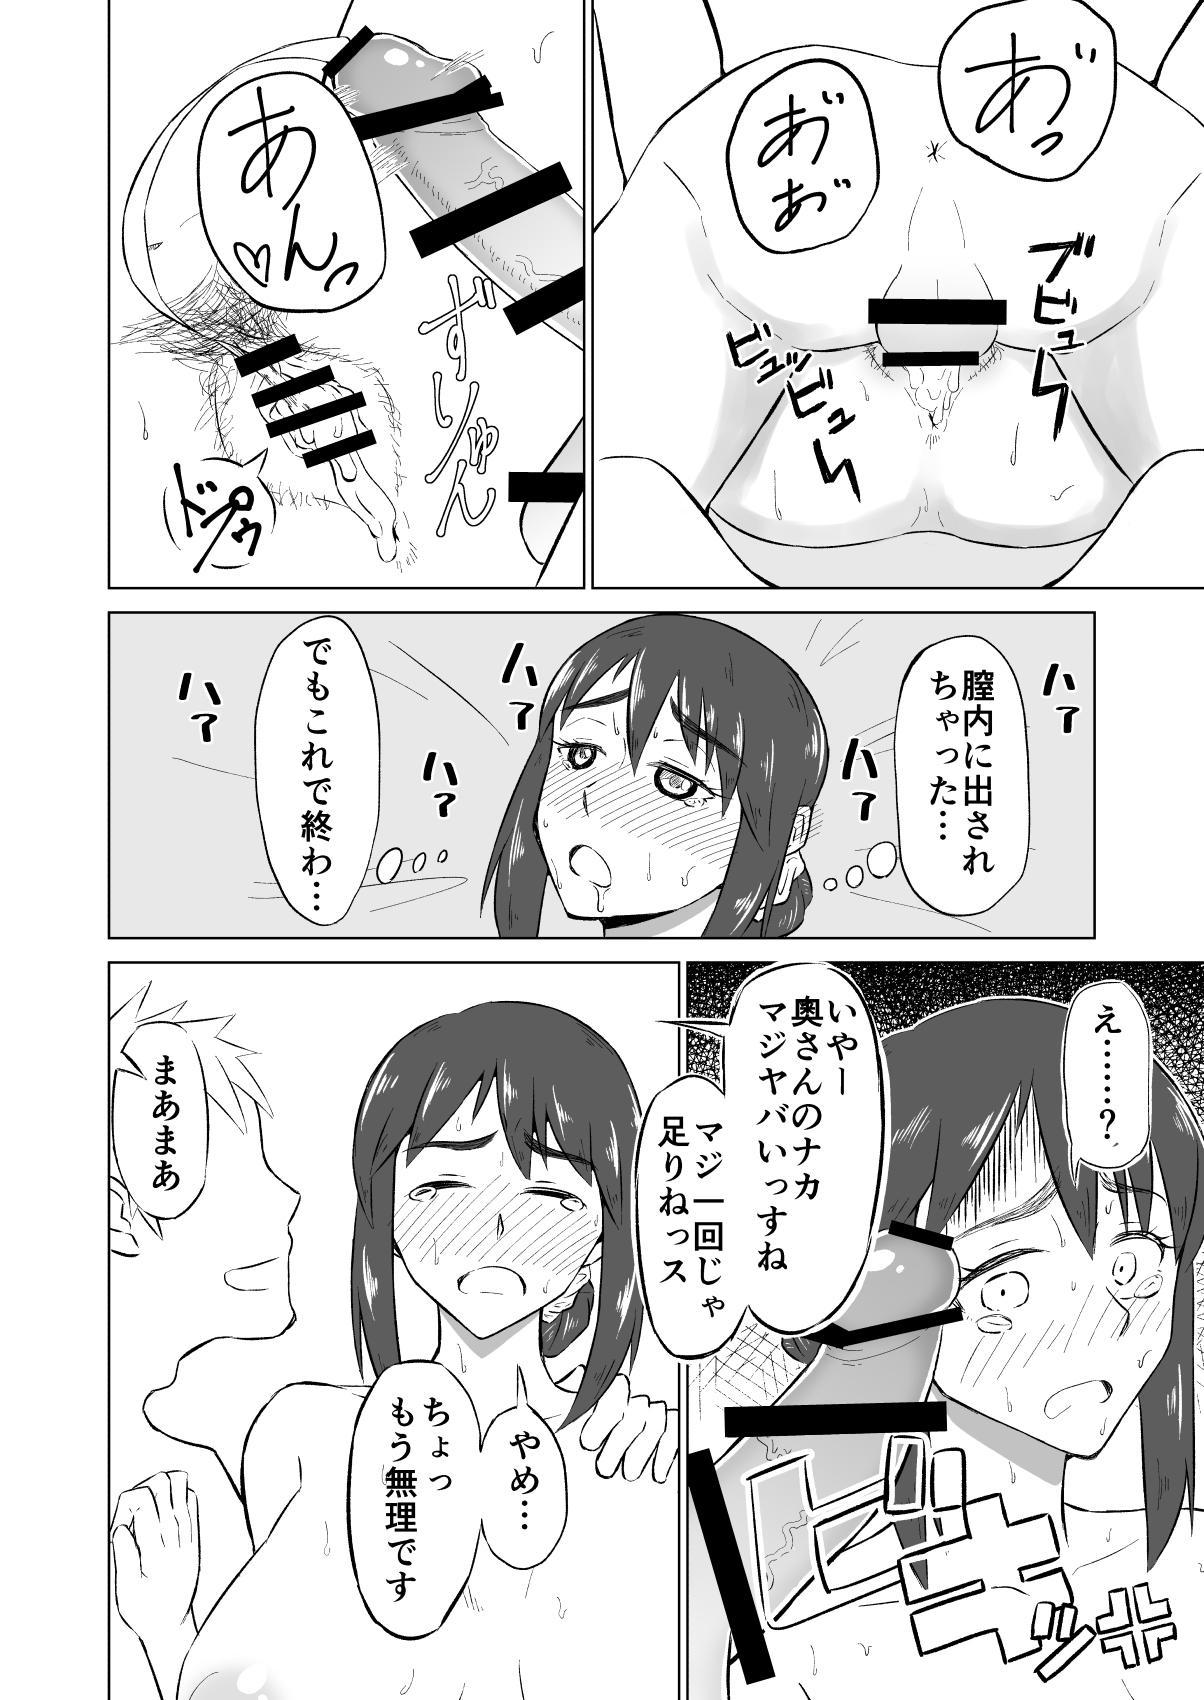 Hitozuma ga Off-kai de Omochikaerare Hon 13